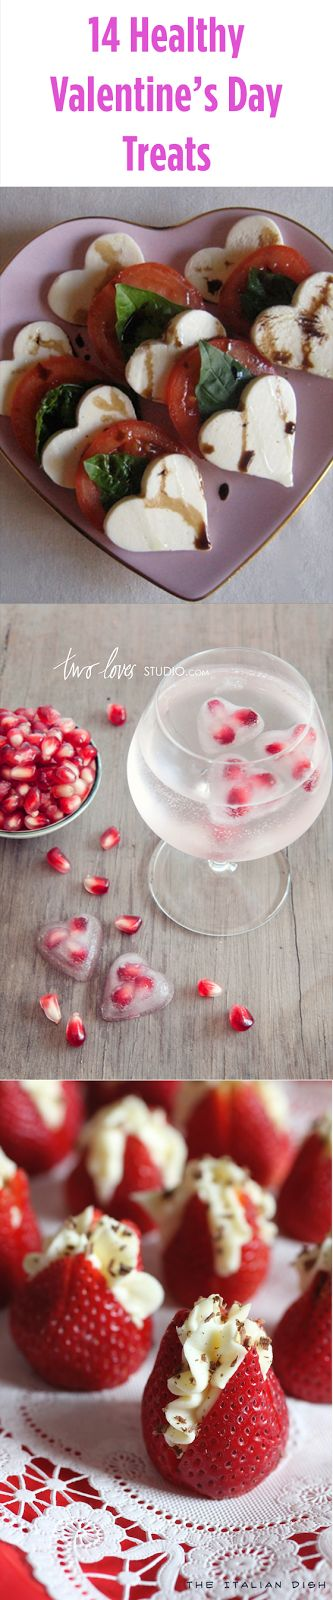 The Top 14 Healthiest Valentine's Day Treats